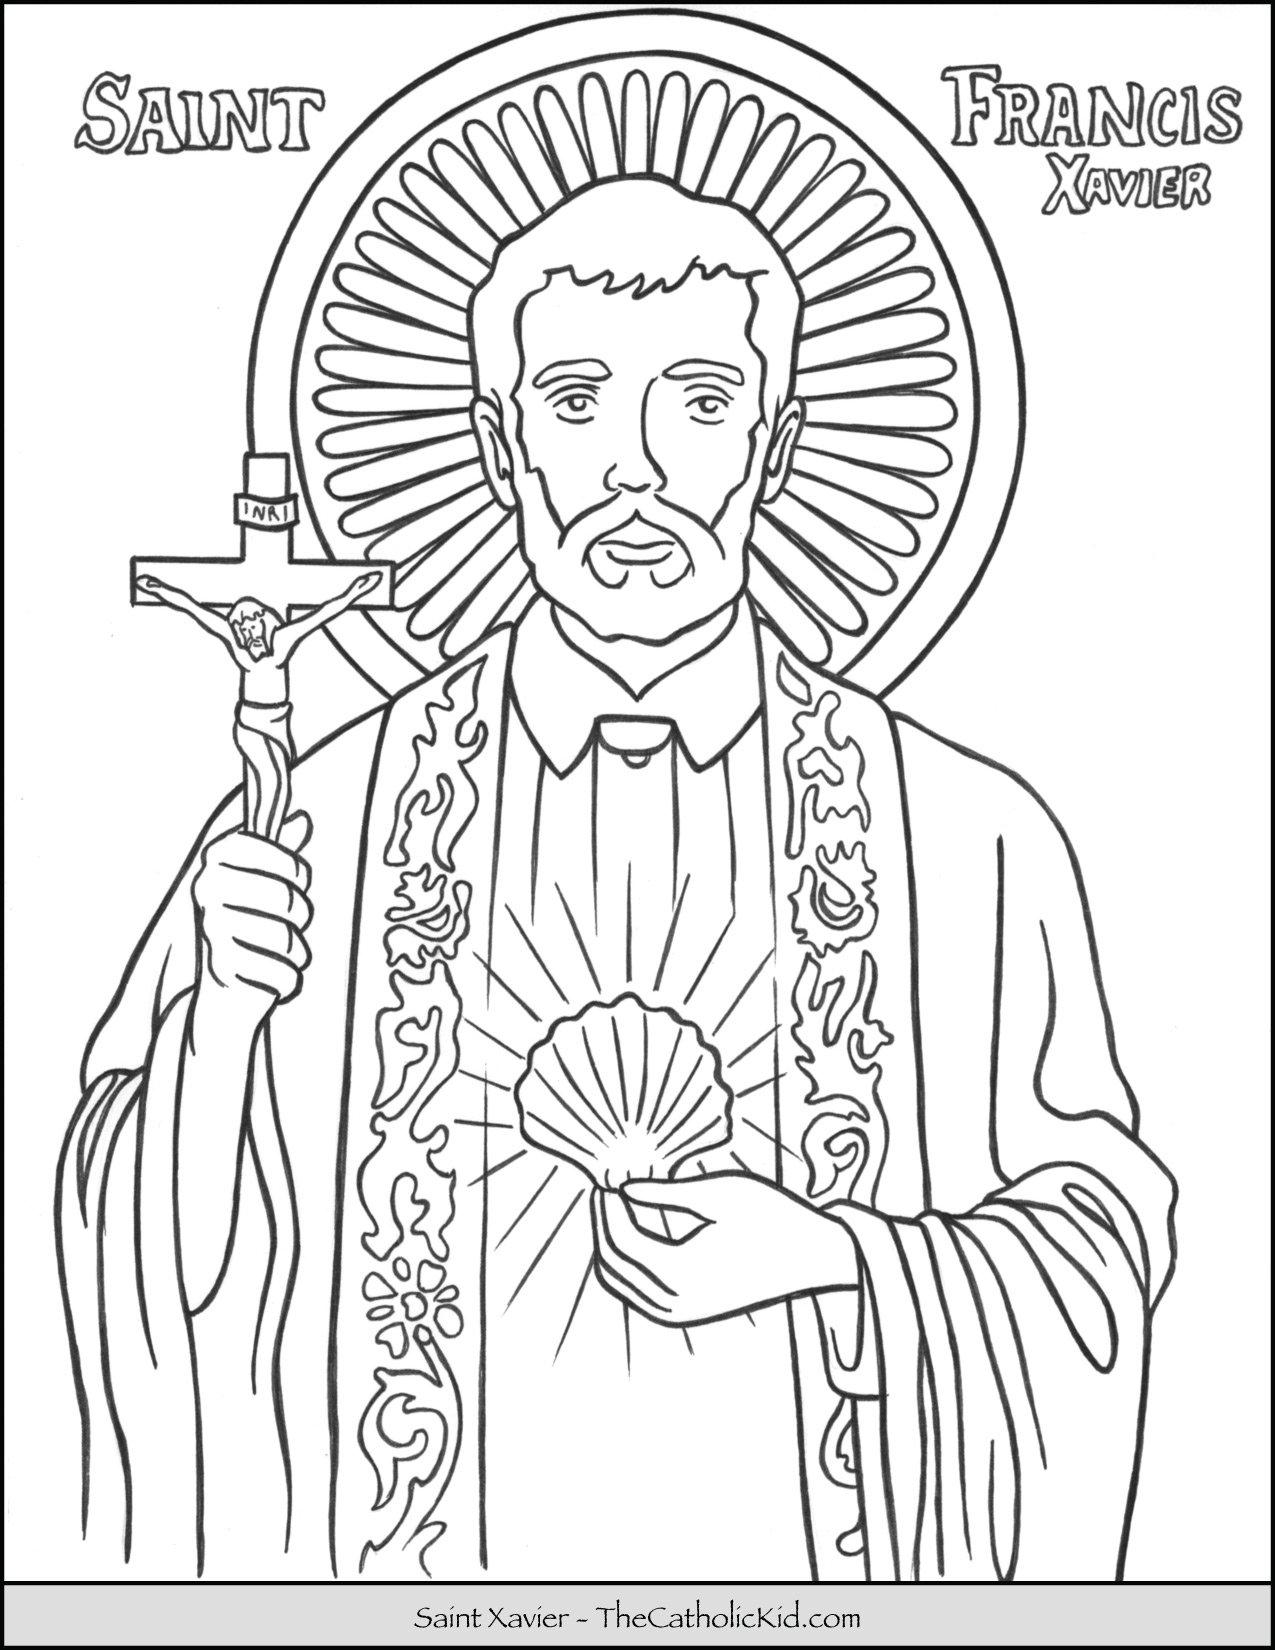 Saint Francis Xavier Coloring Page